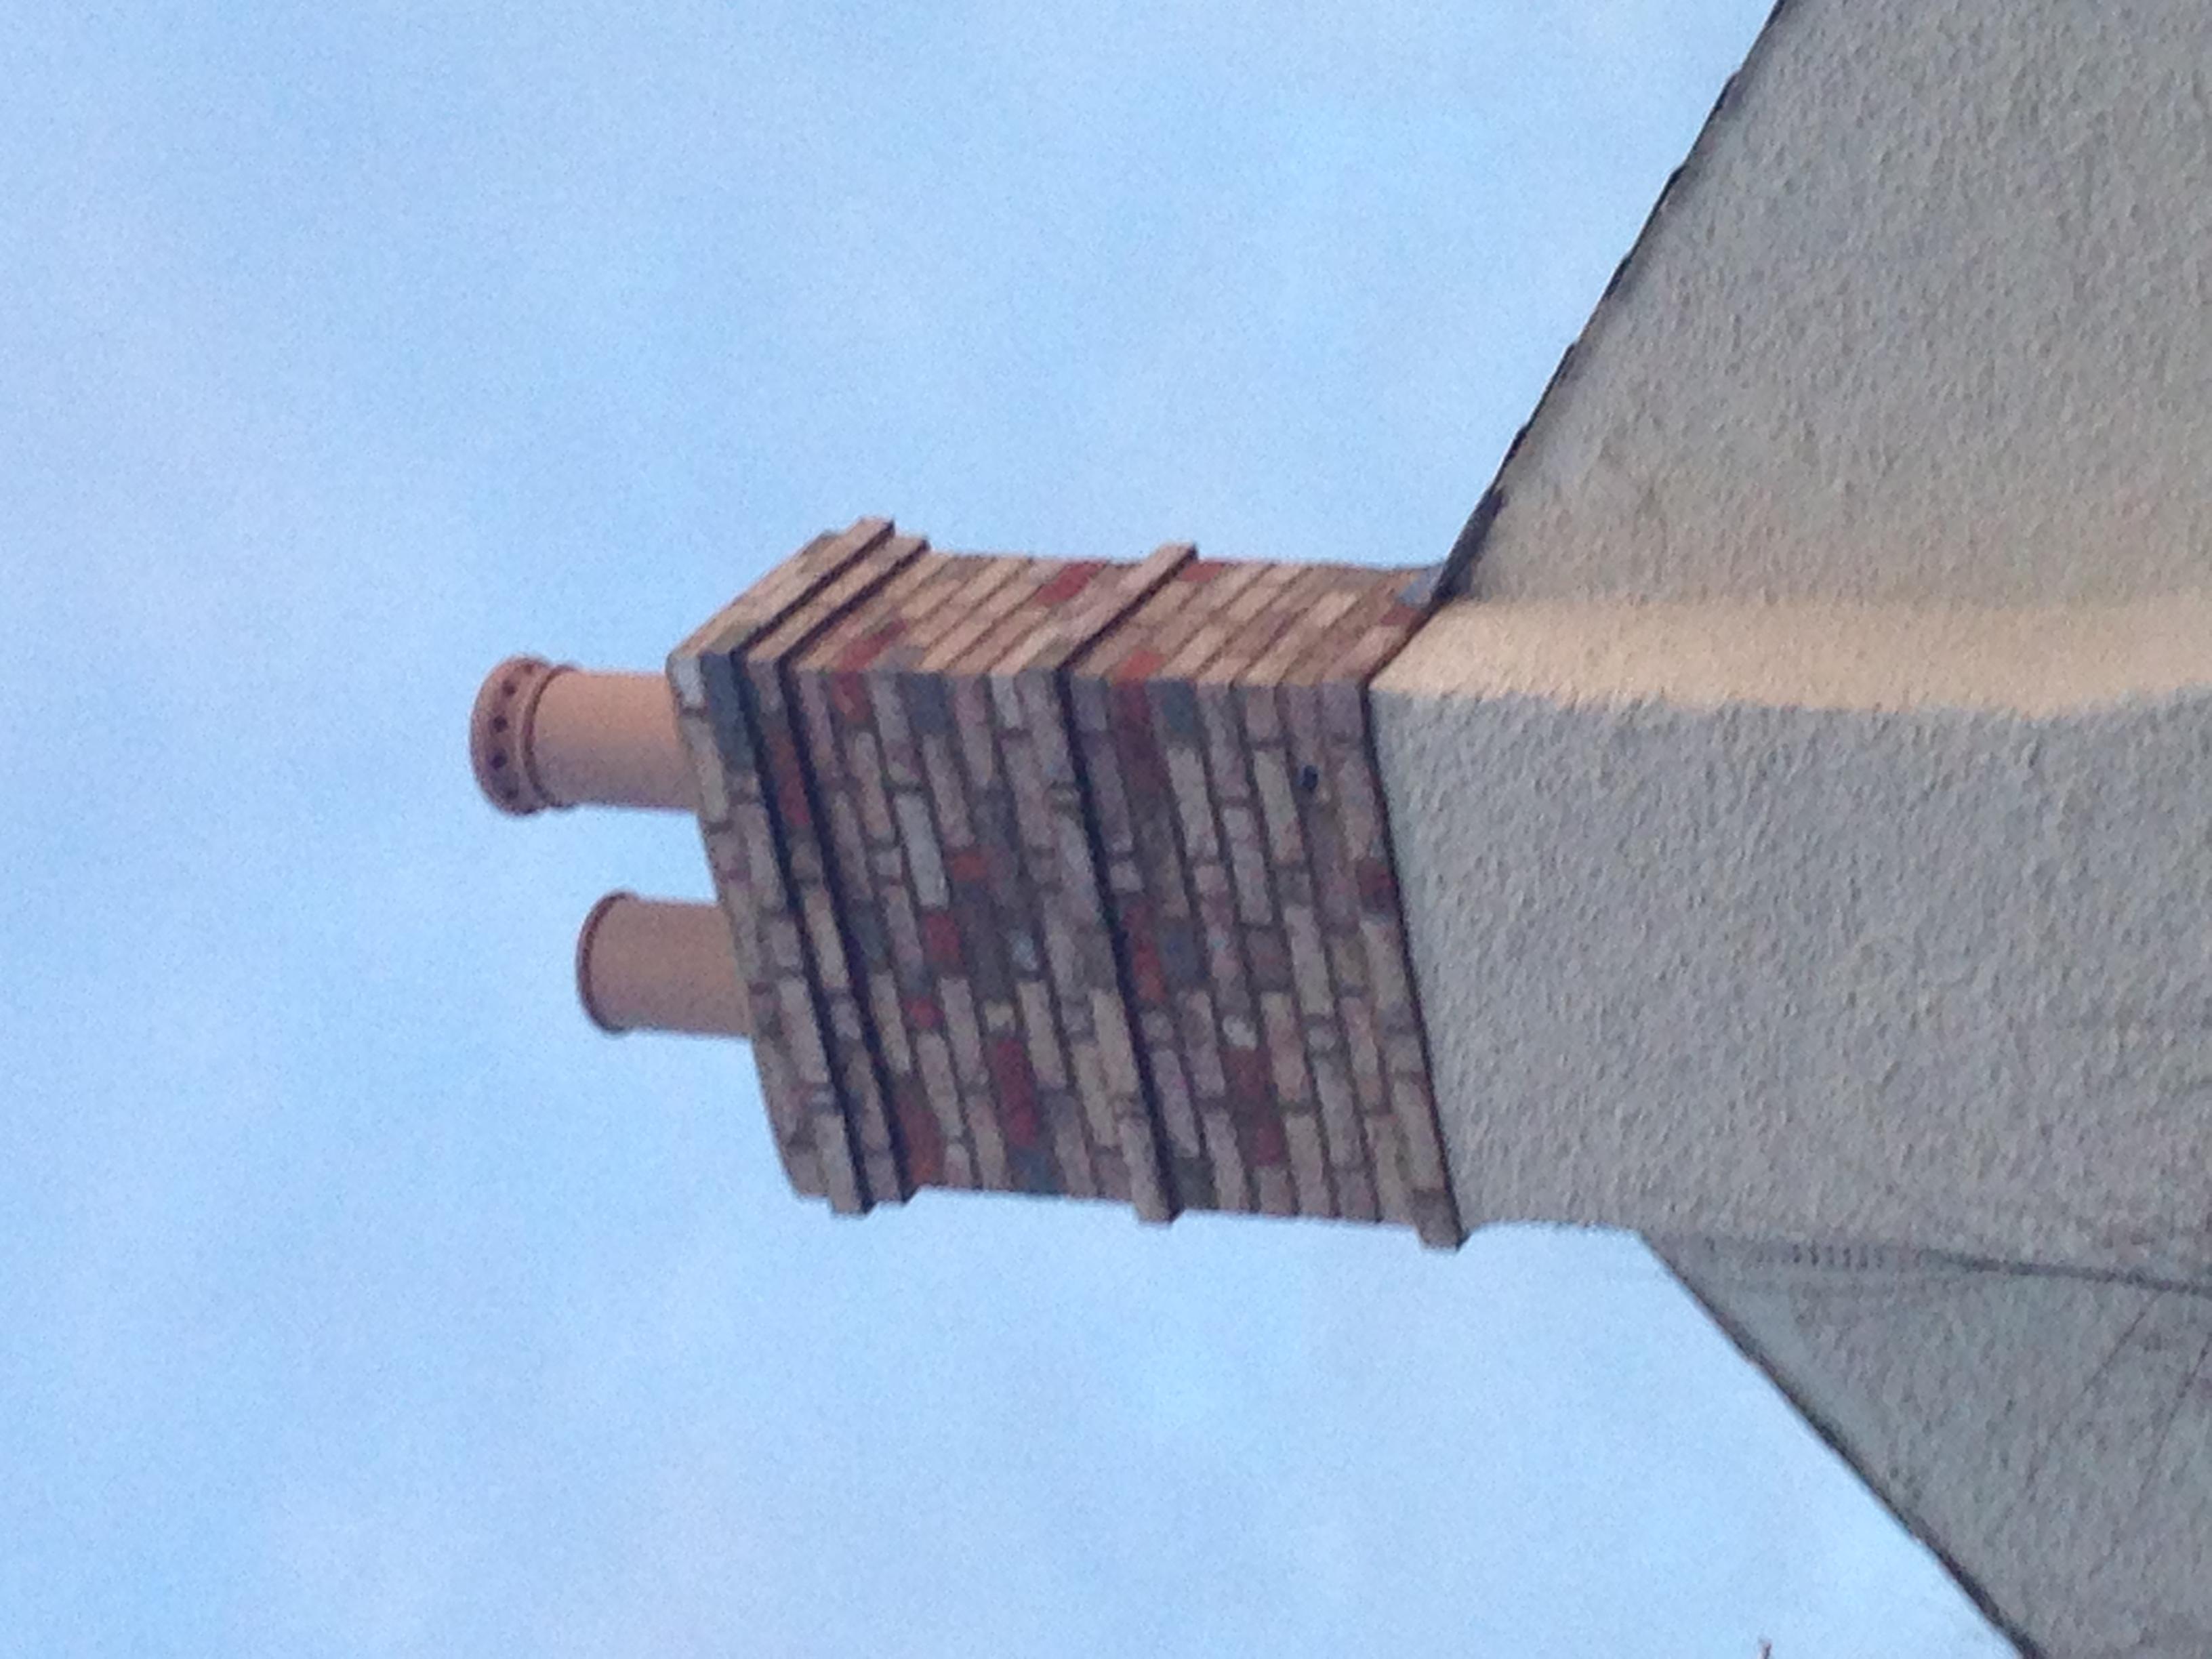 Chimney build